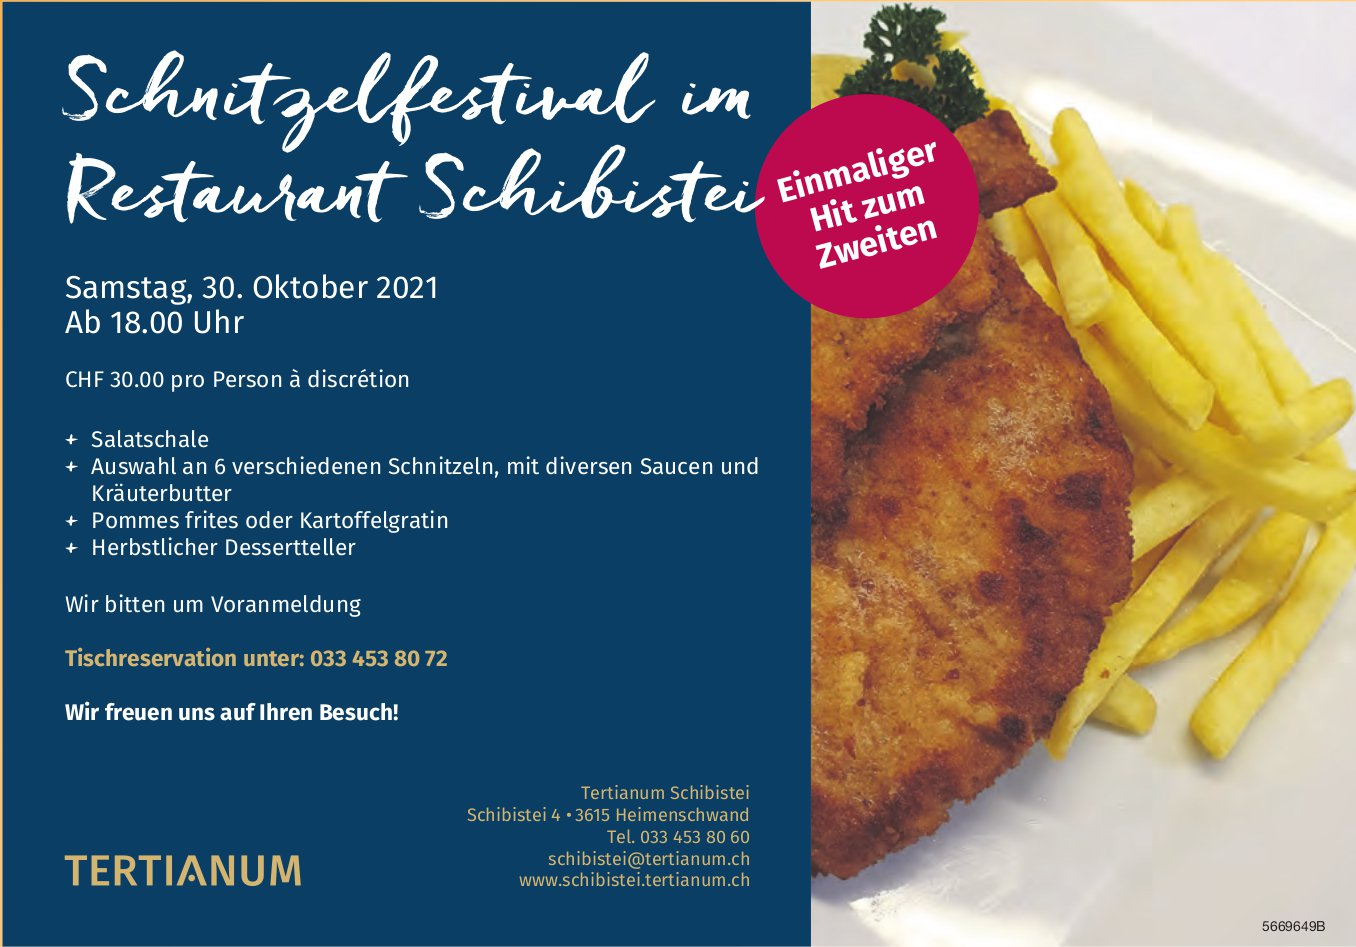 Schnitzelfestival im Restaurant Schibistei, 30. Oktober, Tertianum Schibistei, Heimenschwand